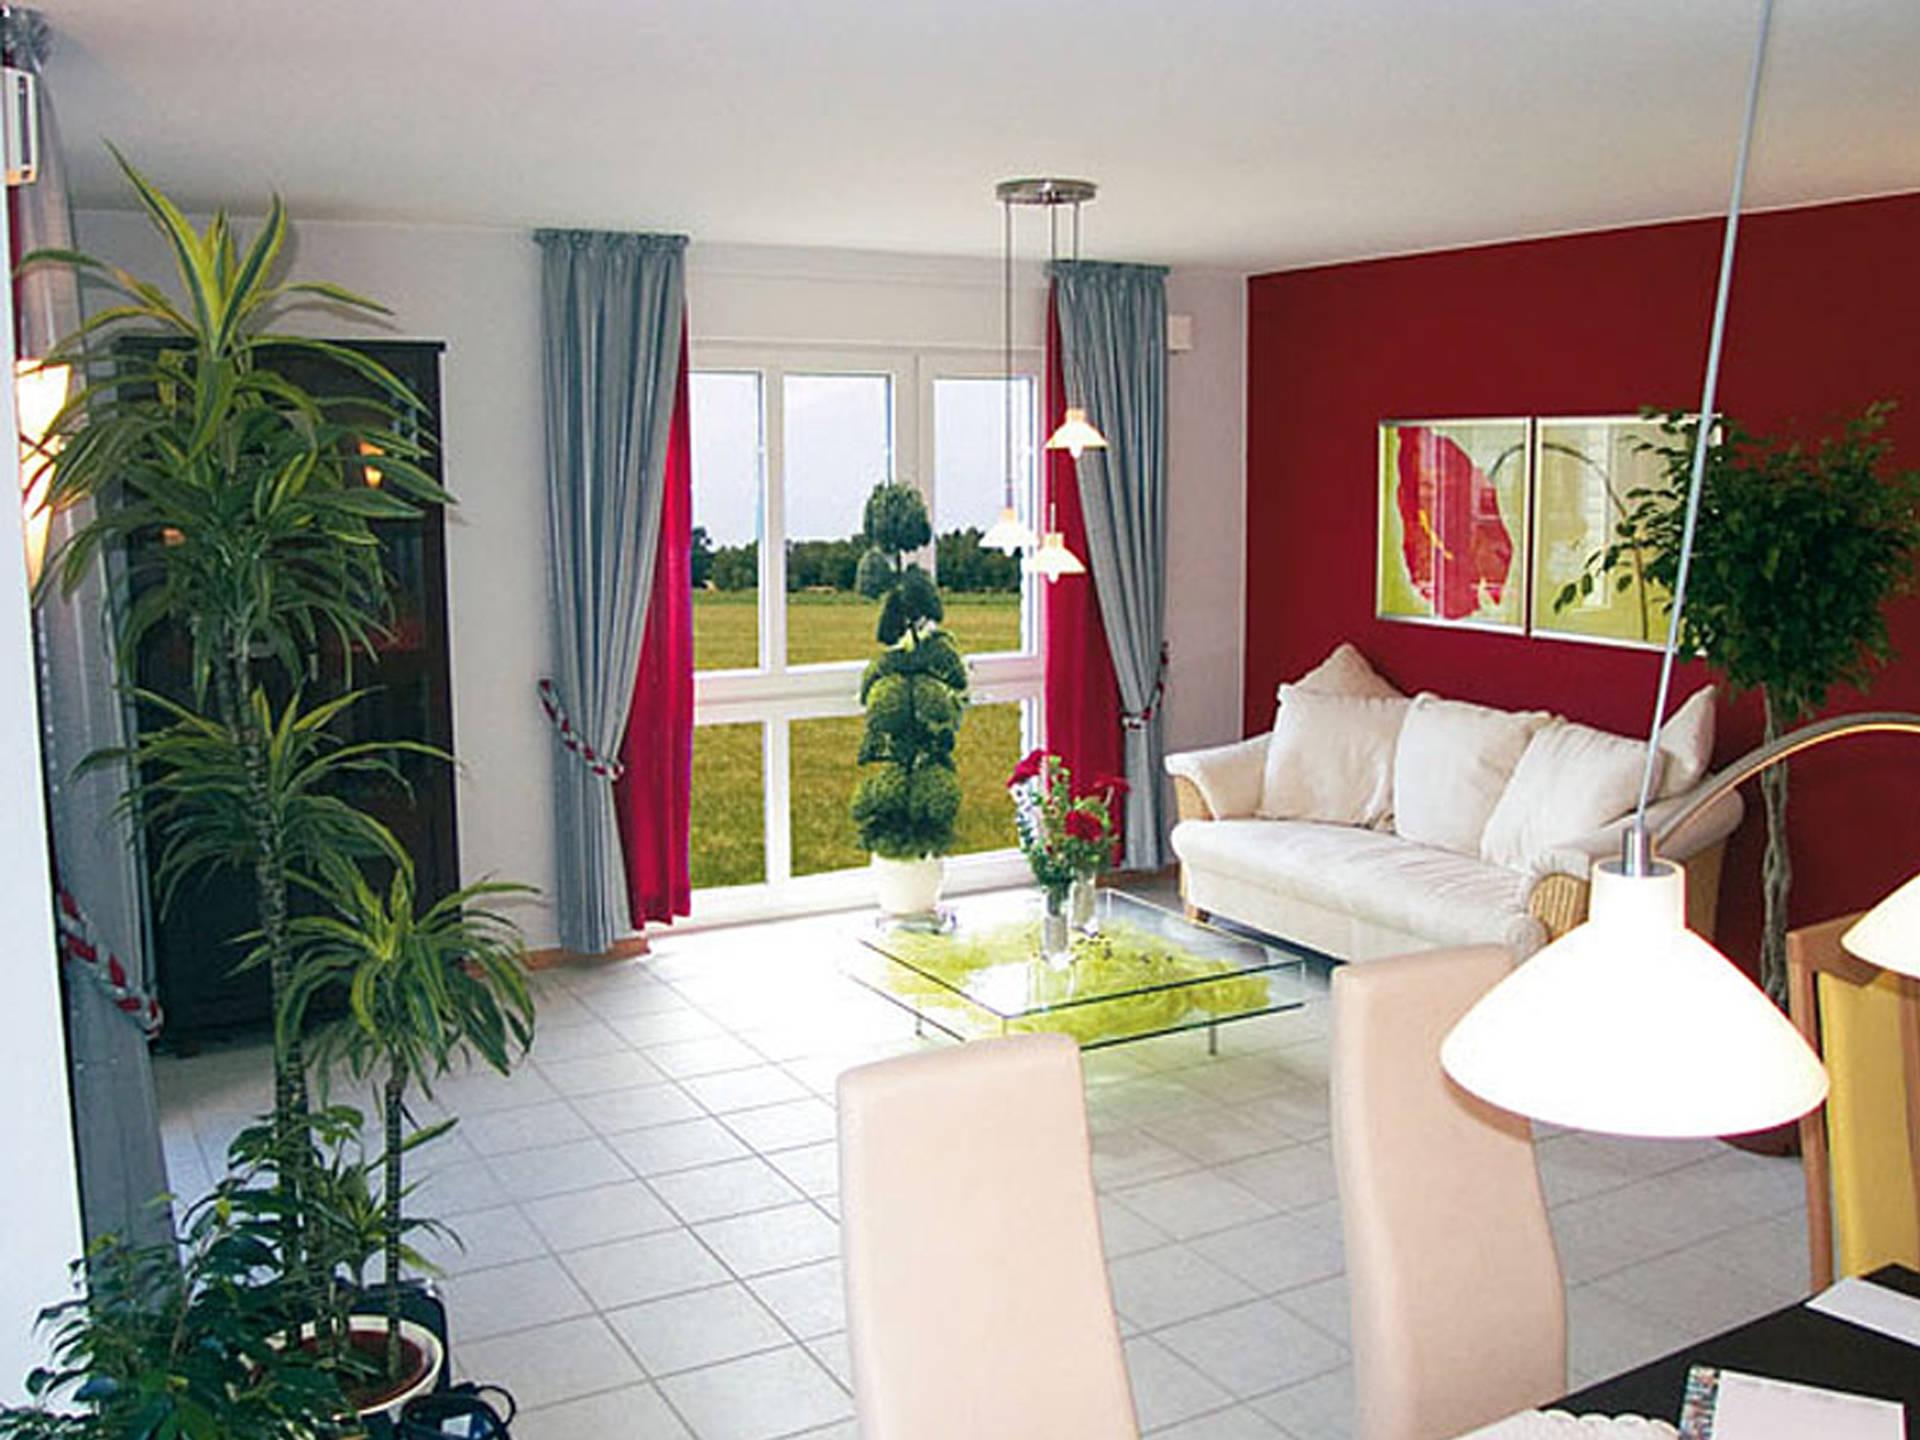 einfamilienhaus berlin helma eigenheimbau. Black Bedroom Furniture Sets. Home Design Ideas